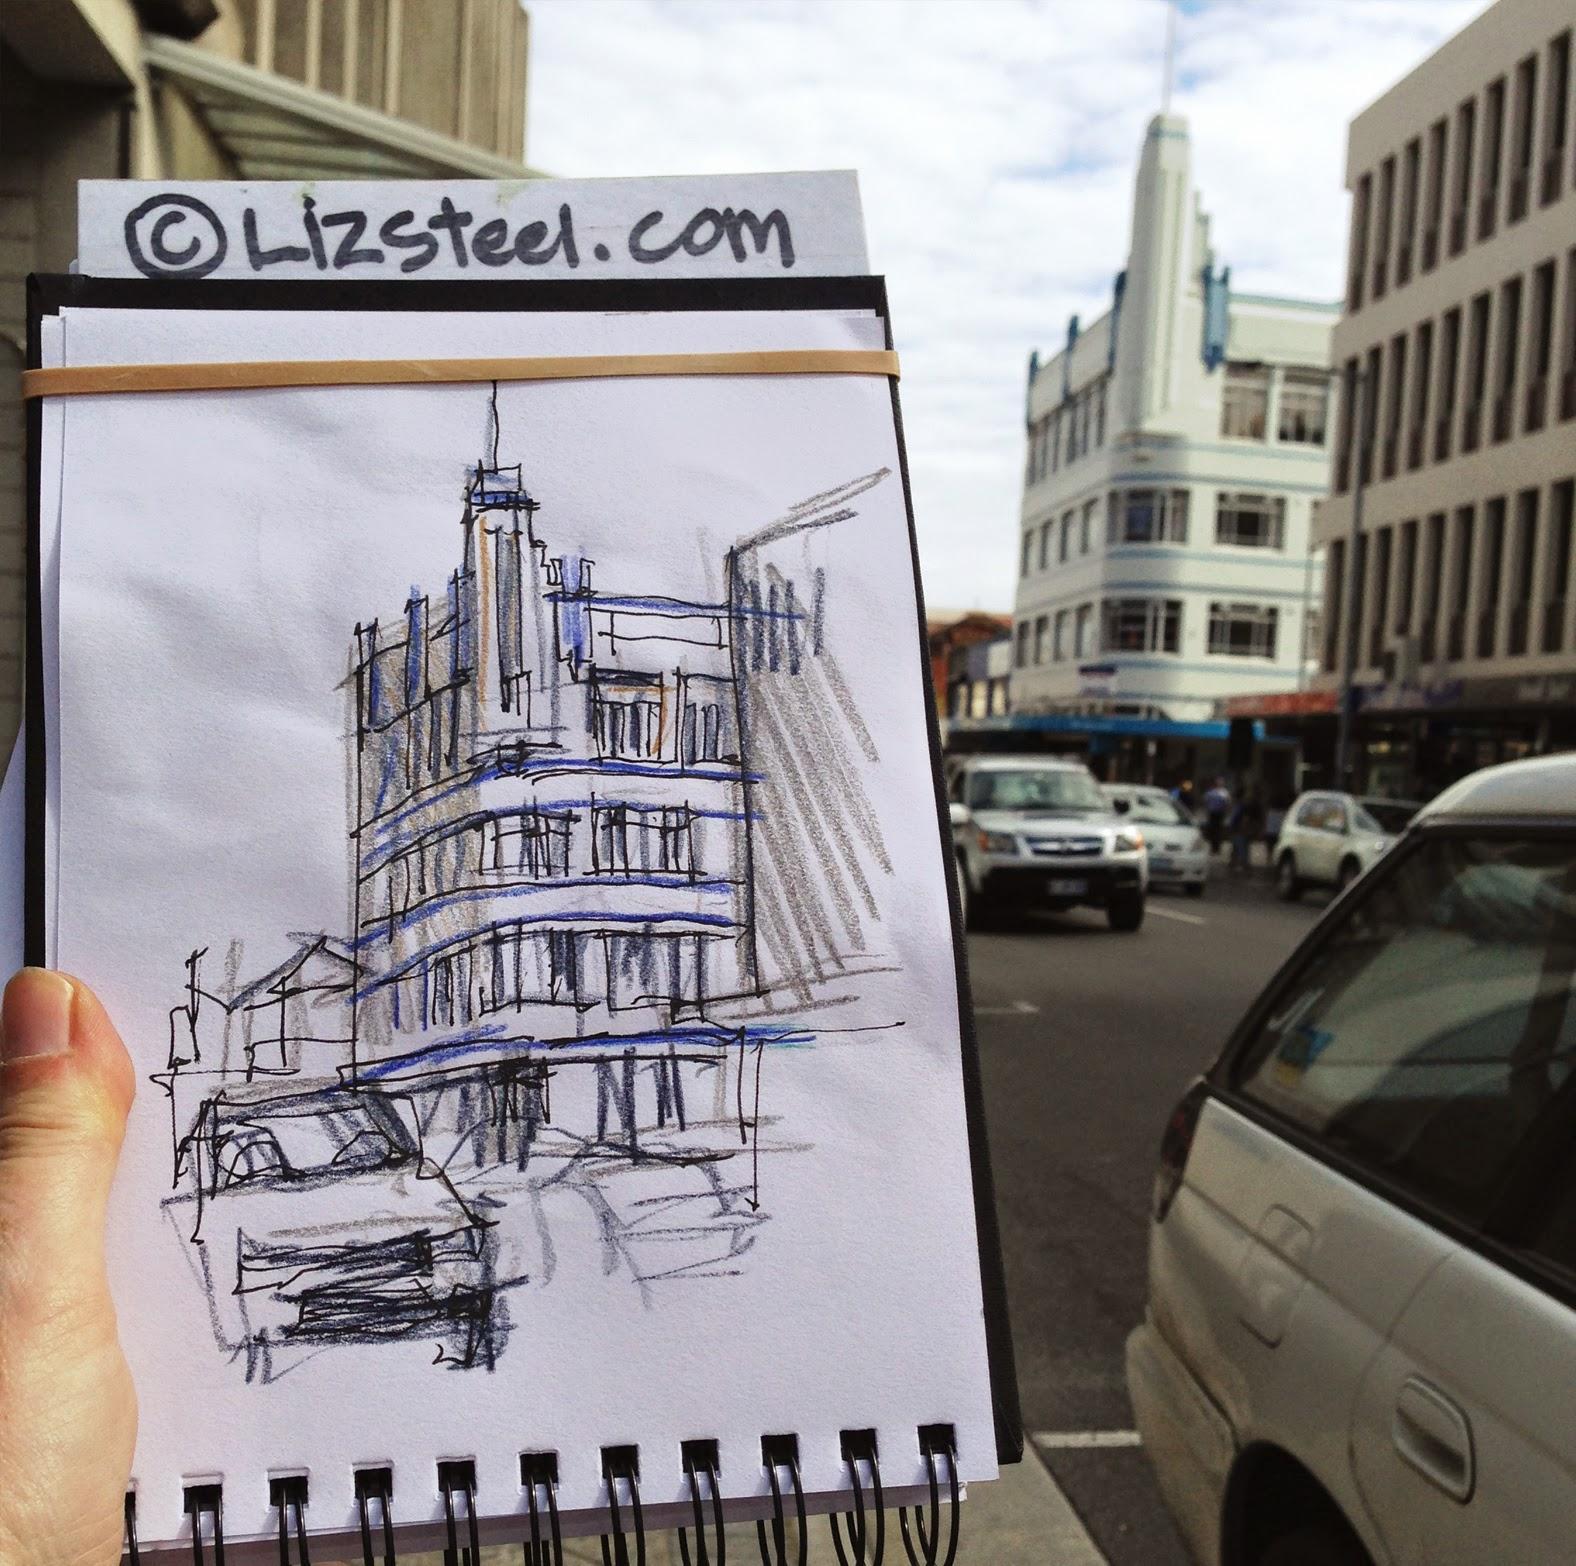 tastrip street scenes vs iconic building sketches liz steel liz